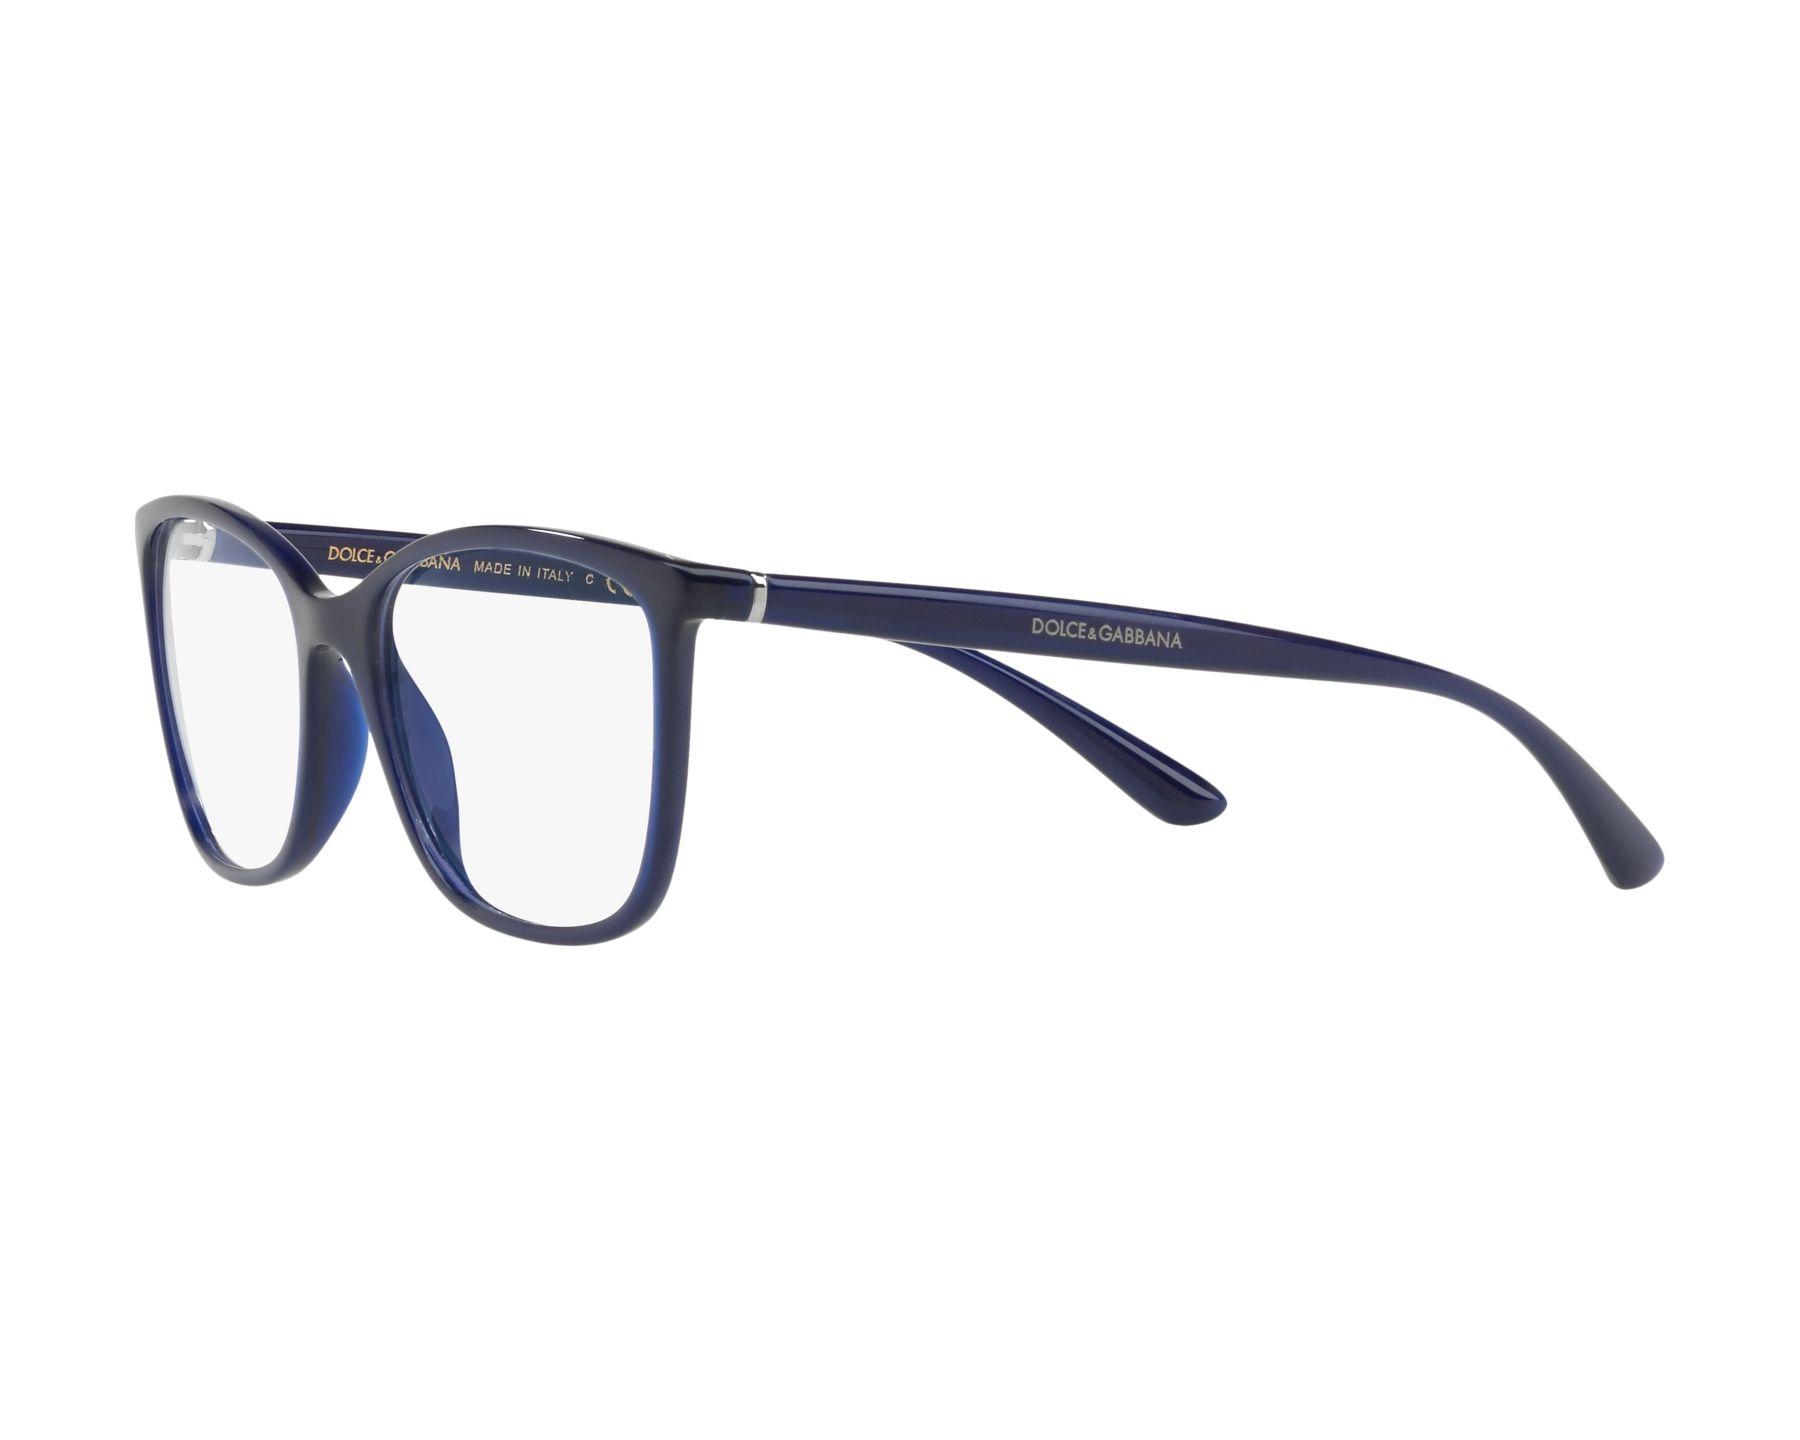 4e597c54fbb eyeglasses Dolce   Gabbana DG-5026 3094 54-17 Blue 360 degree view 3